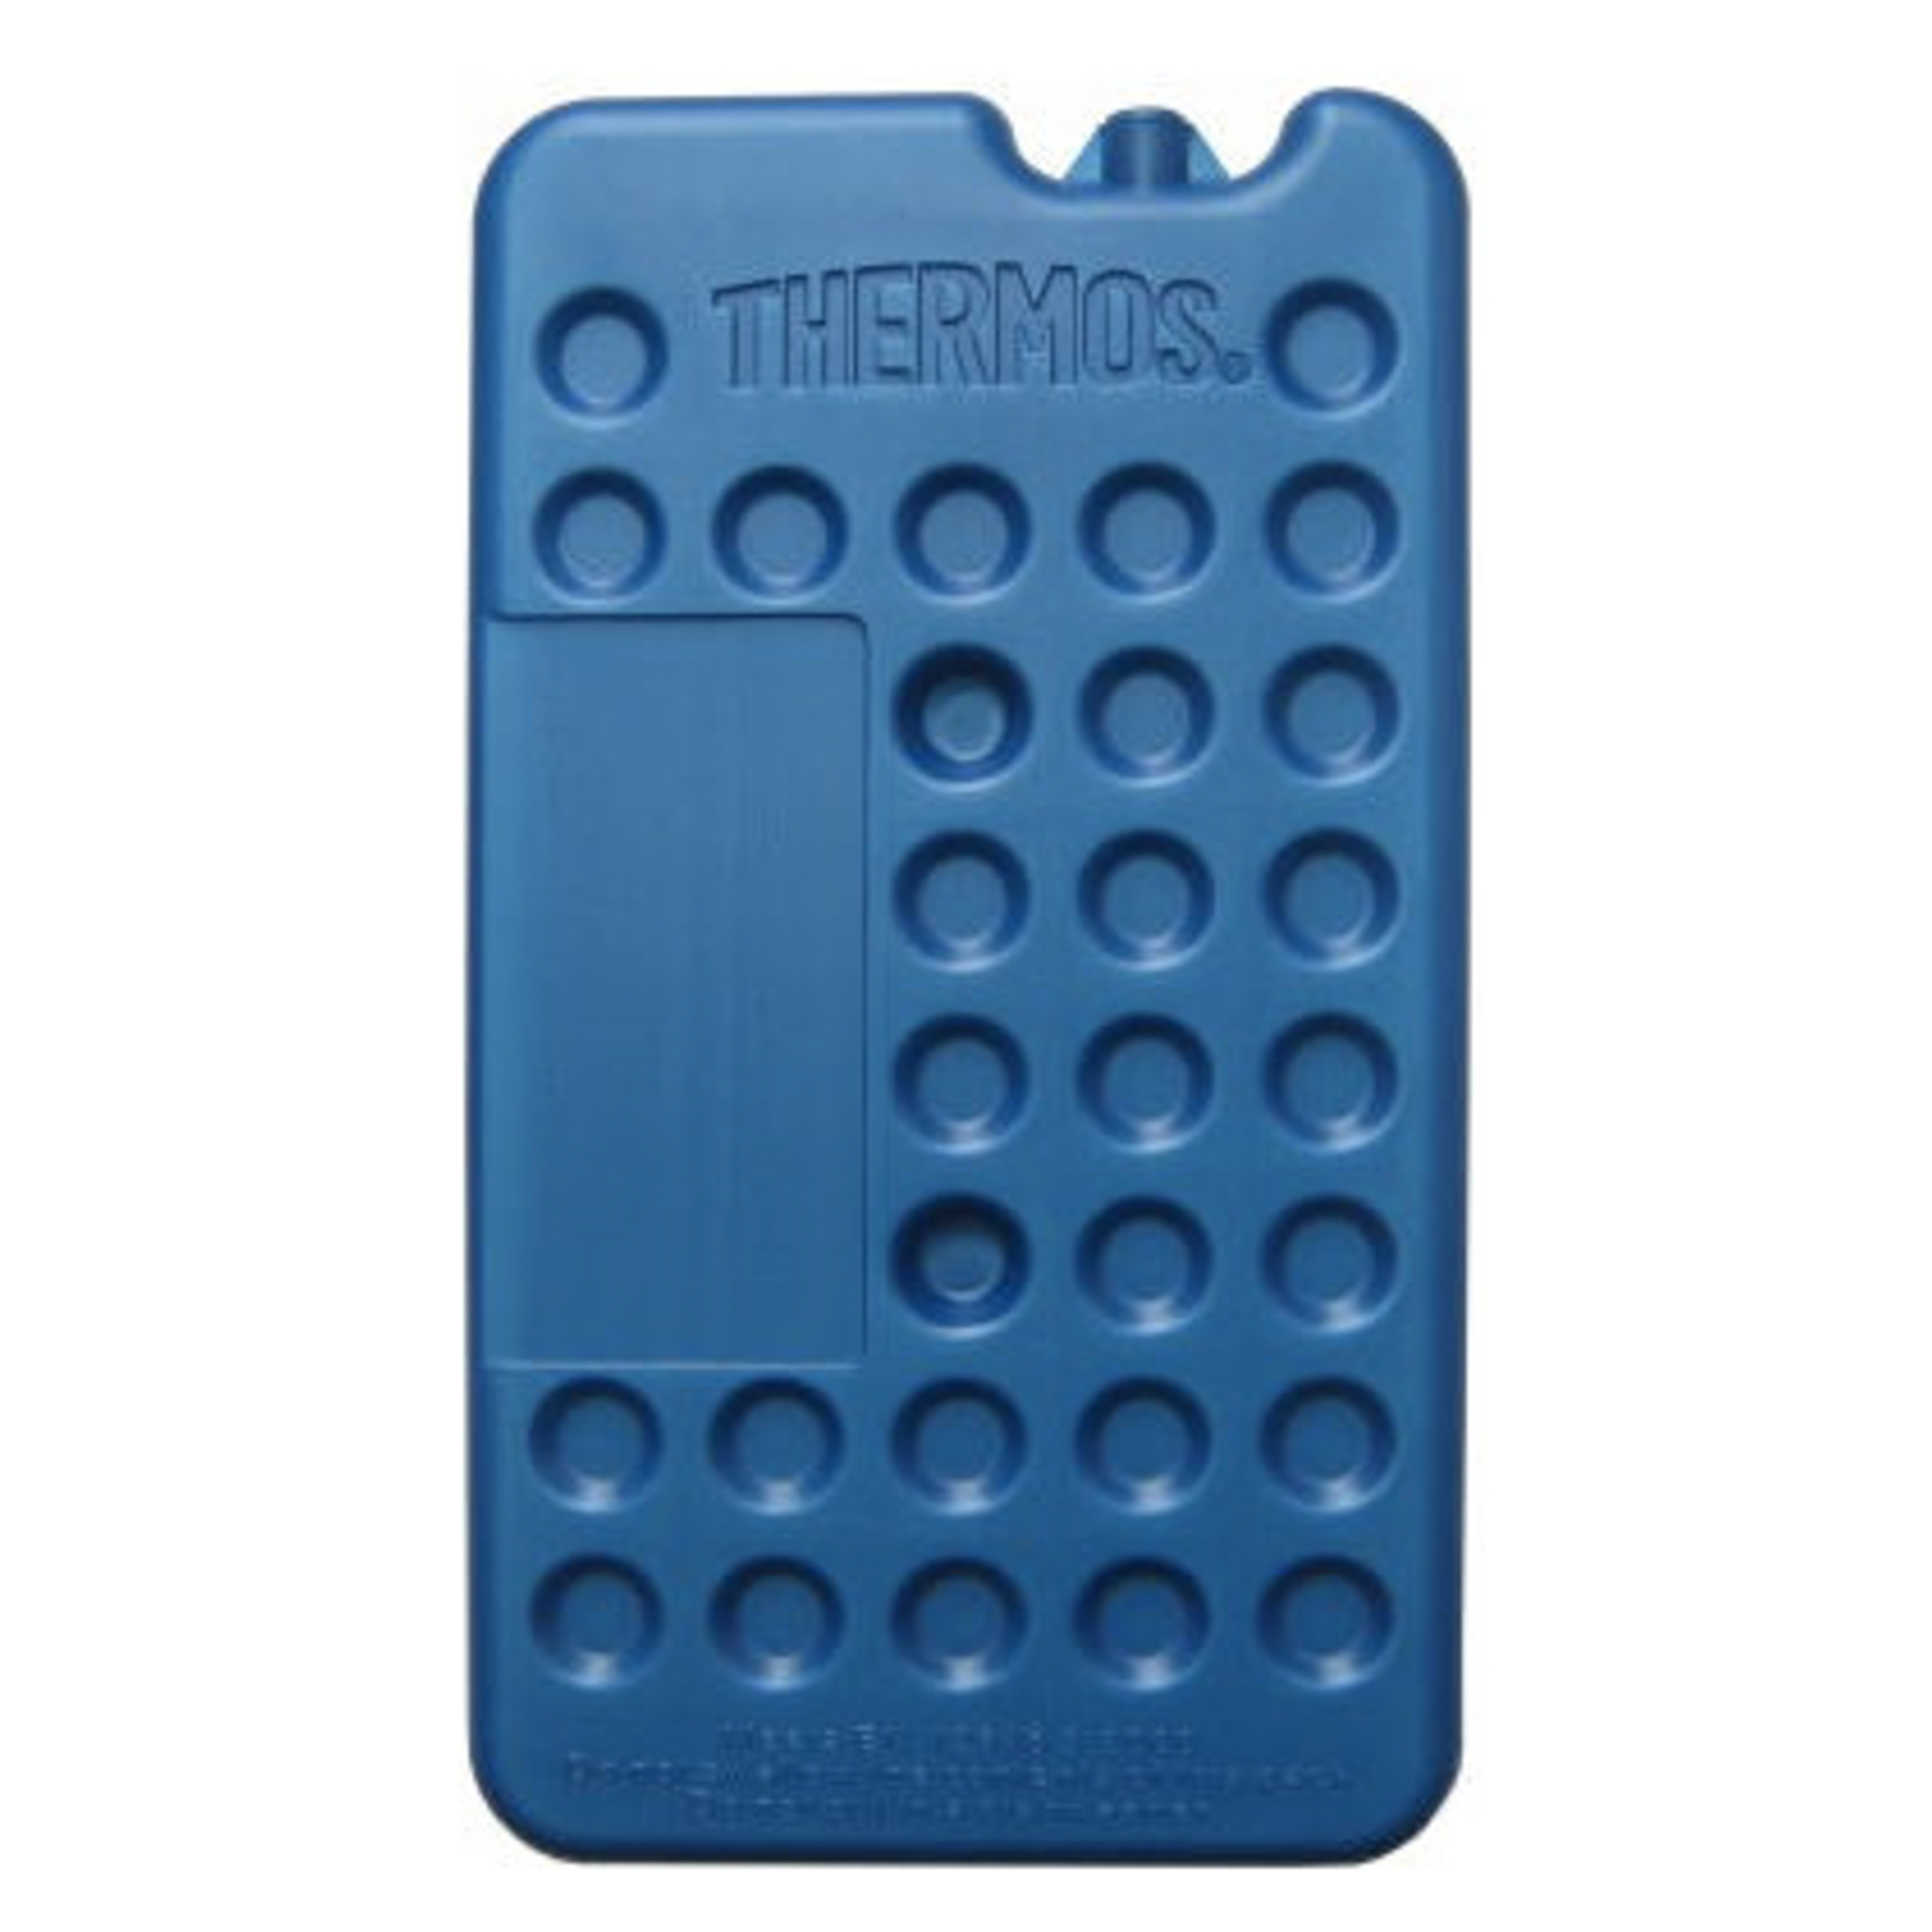 Аккумуляторы холода Thermos Medium Size Freezing Board 400 г